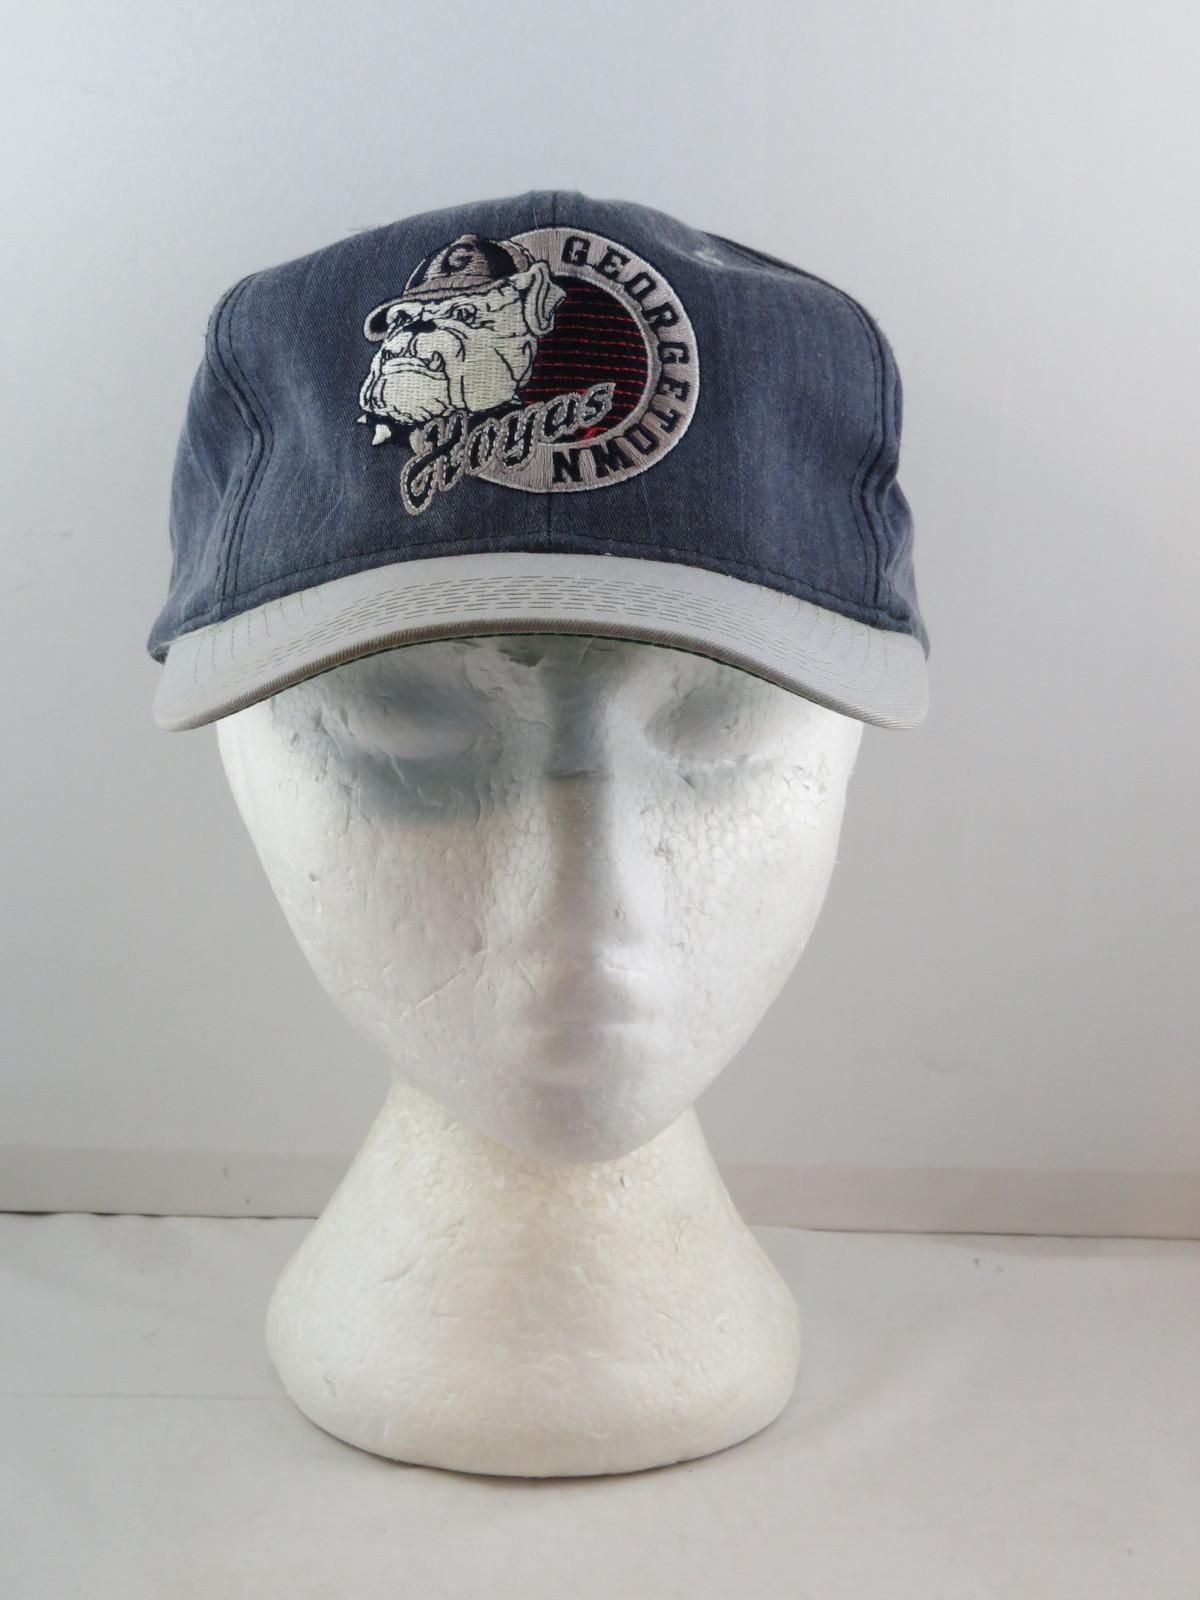 Georgetown Hoyas Hat - Stone Wash big Logo by Starter - Adult Snapback